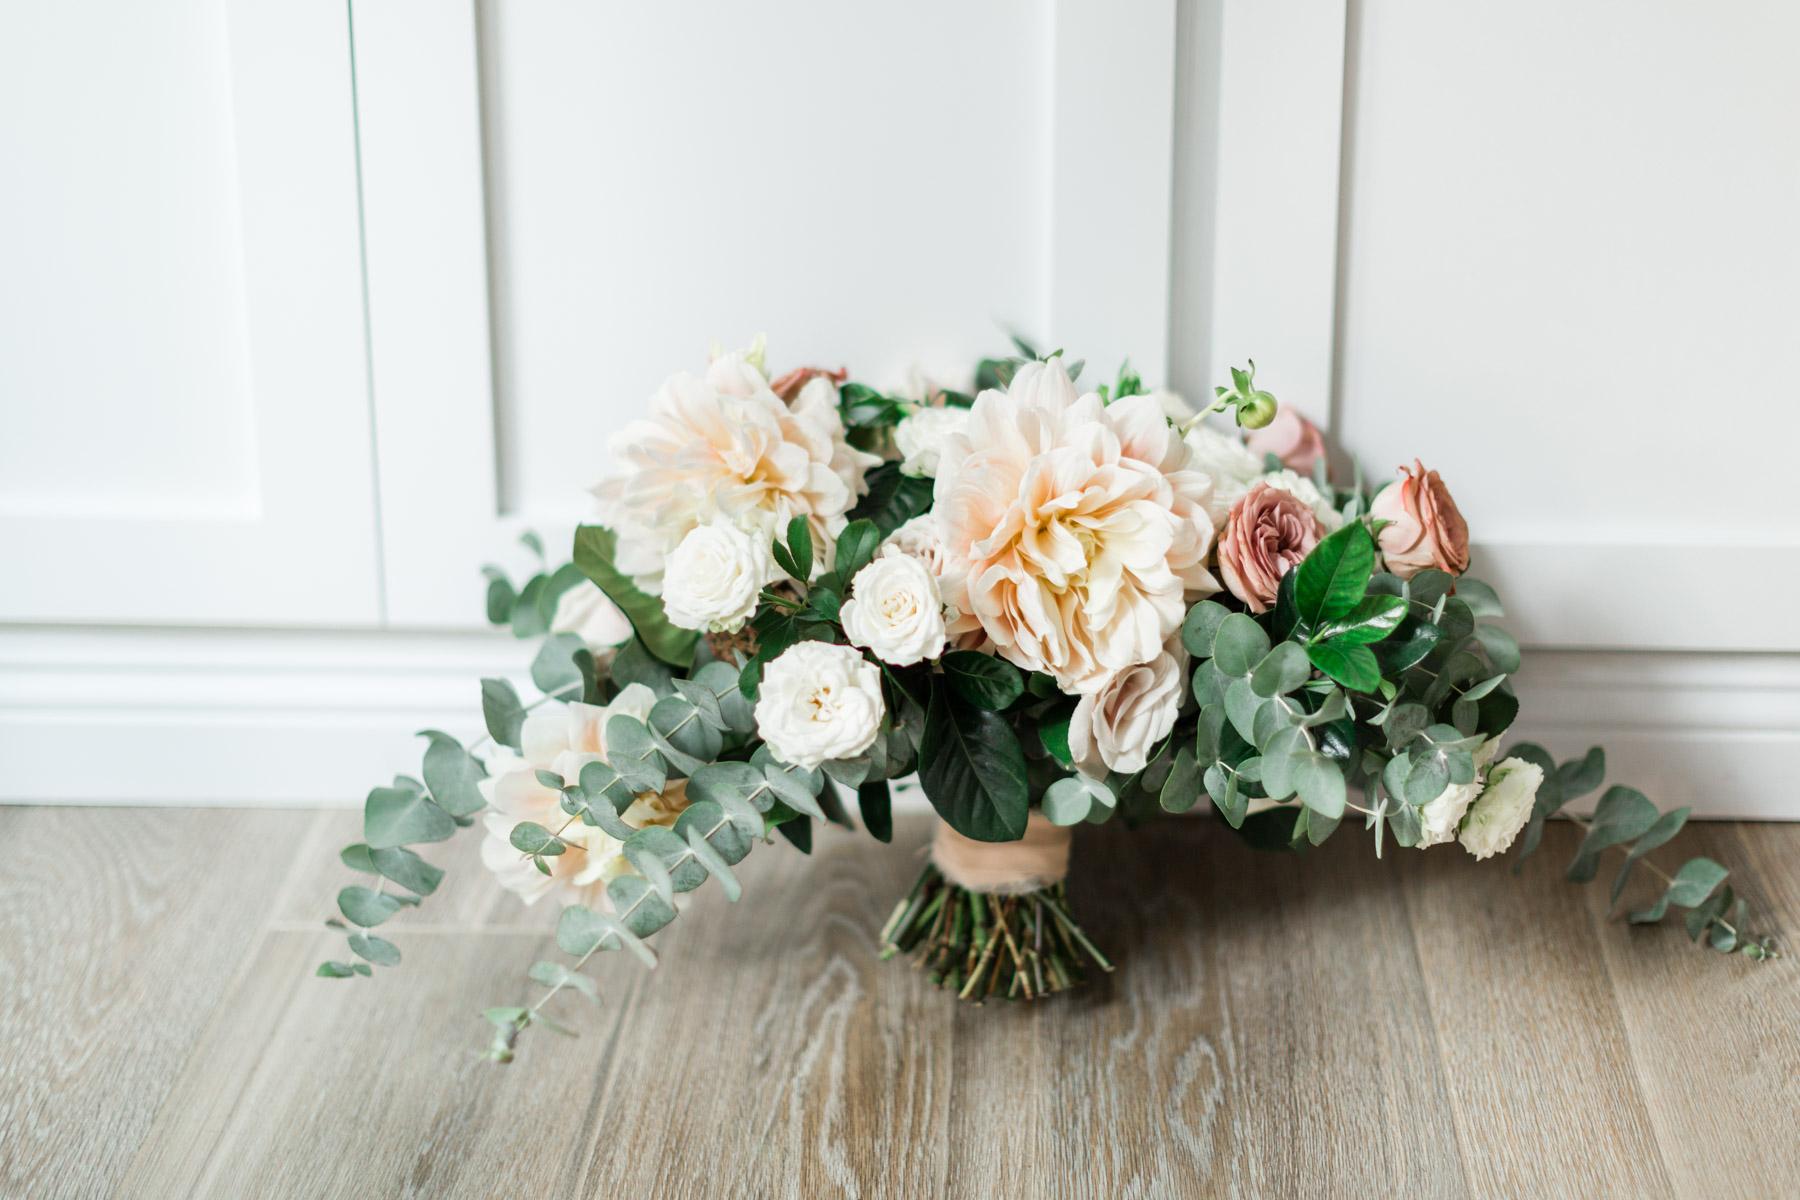 Romantic dahlia, rose and eucalyptus bridal bouquet | Newport Beach, CA | Compass Floral | Wedding Florist in San Diego and Southern California | Cavin Elizabeth Photography